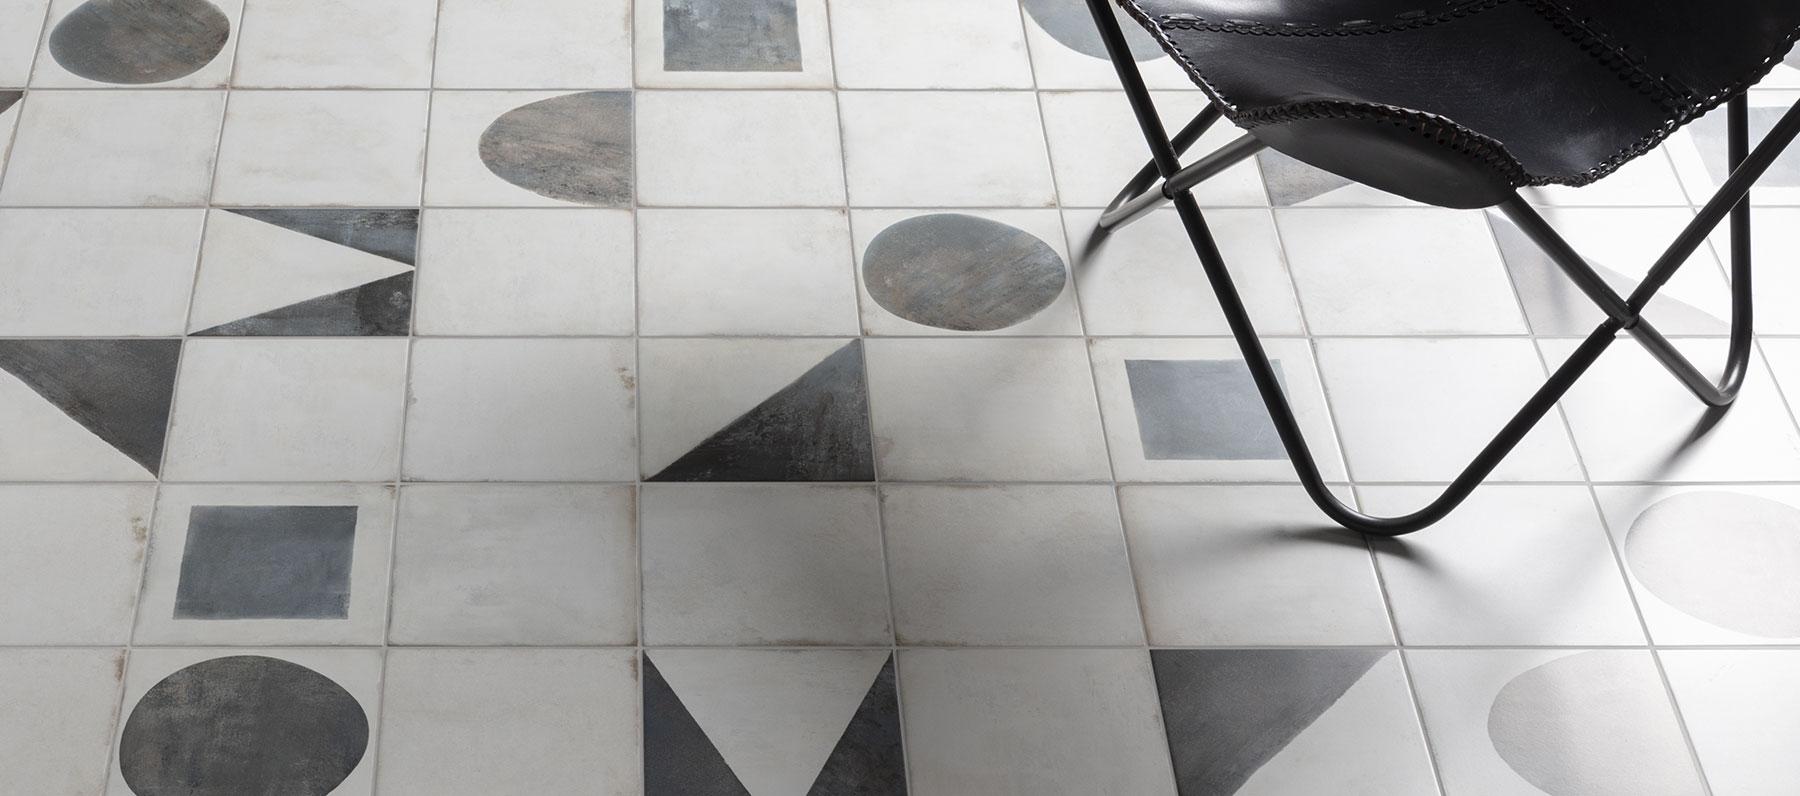 Piastrelle per uffici moderni tra flessibilità e formule progettuali aperte